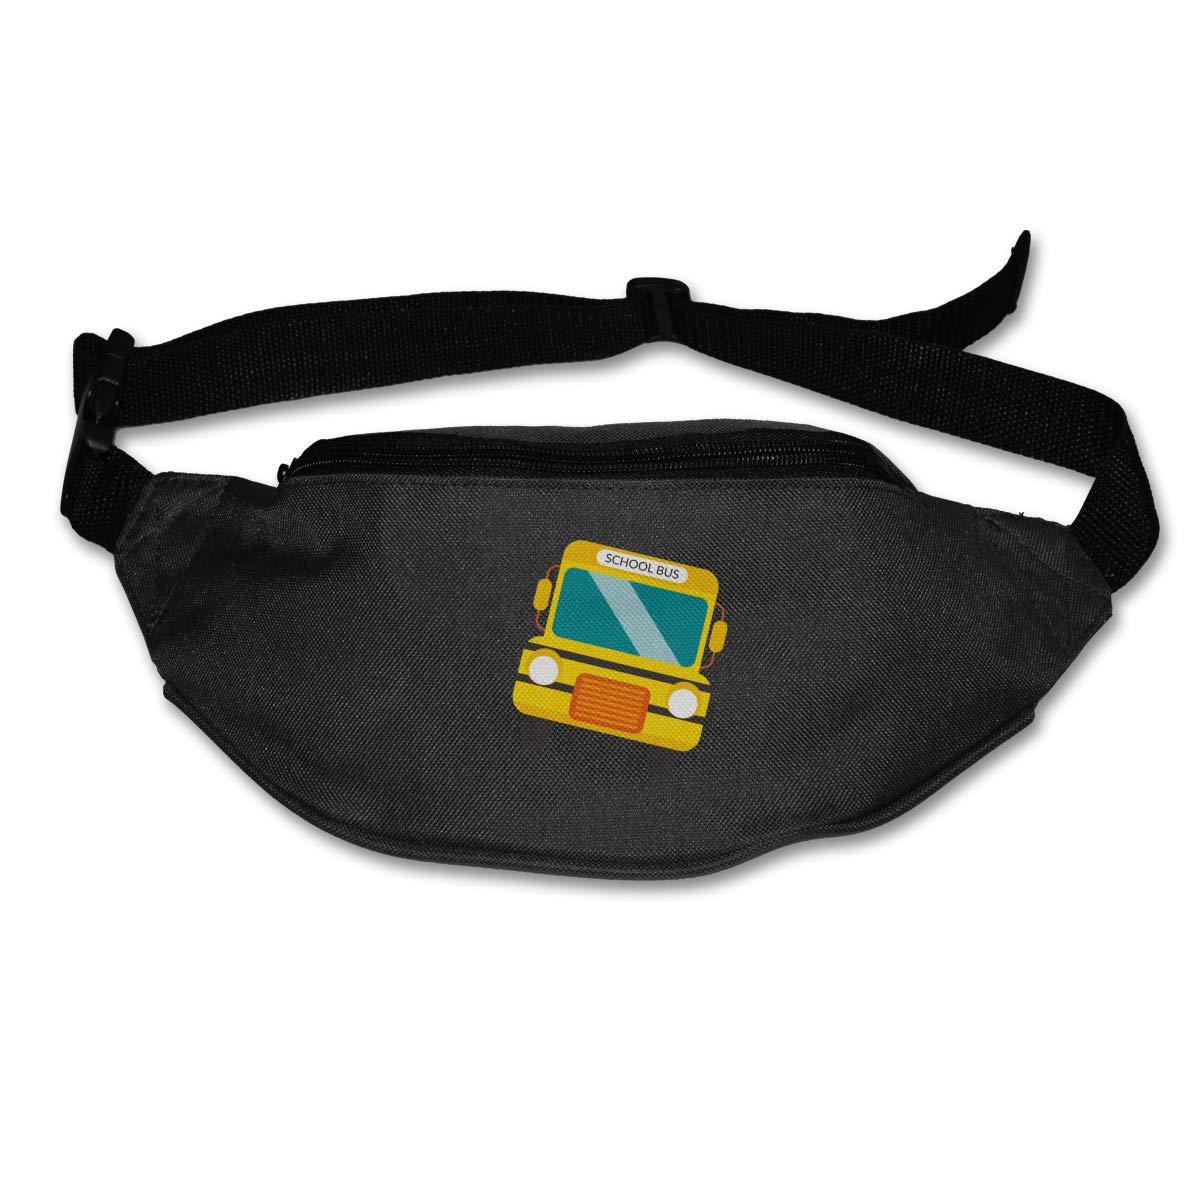 School Bus Sport Waist Bag Fanny Pack Adjustable For Run